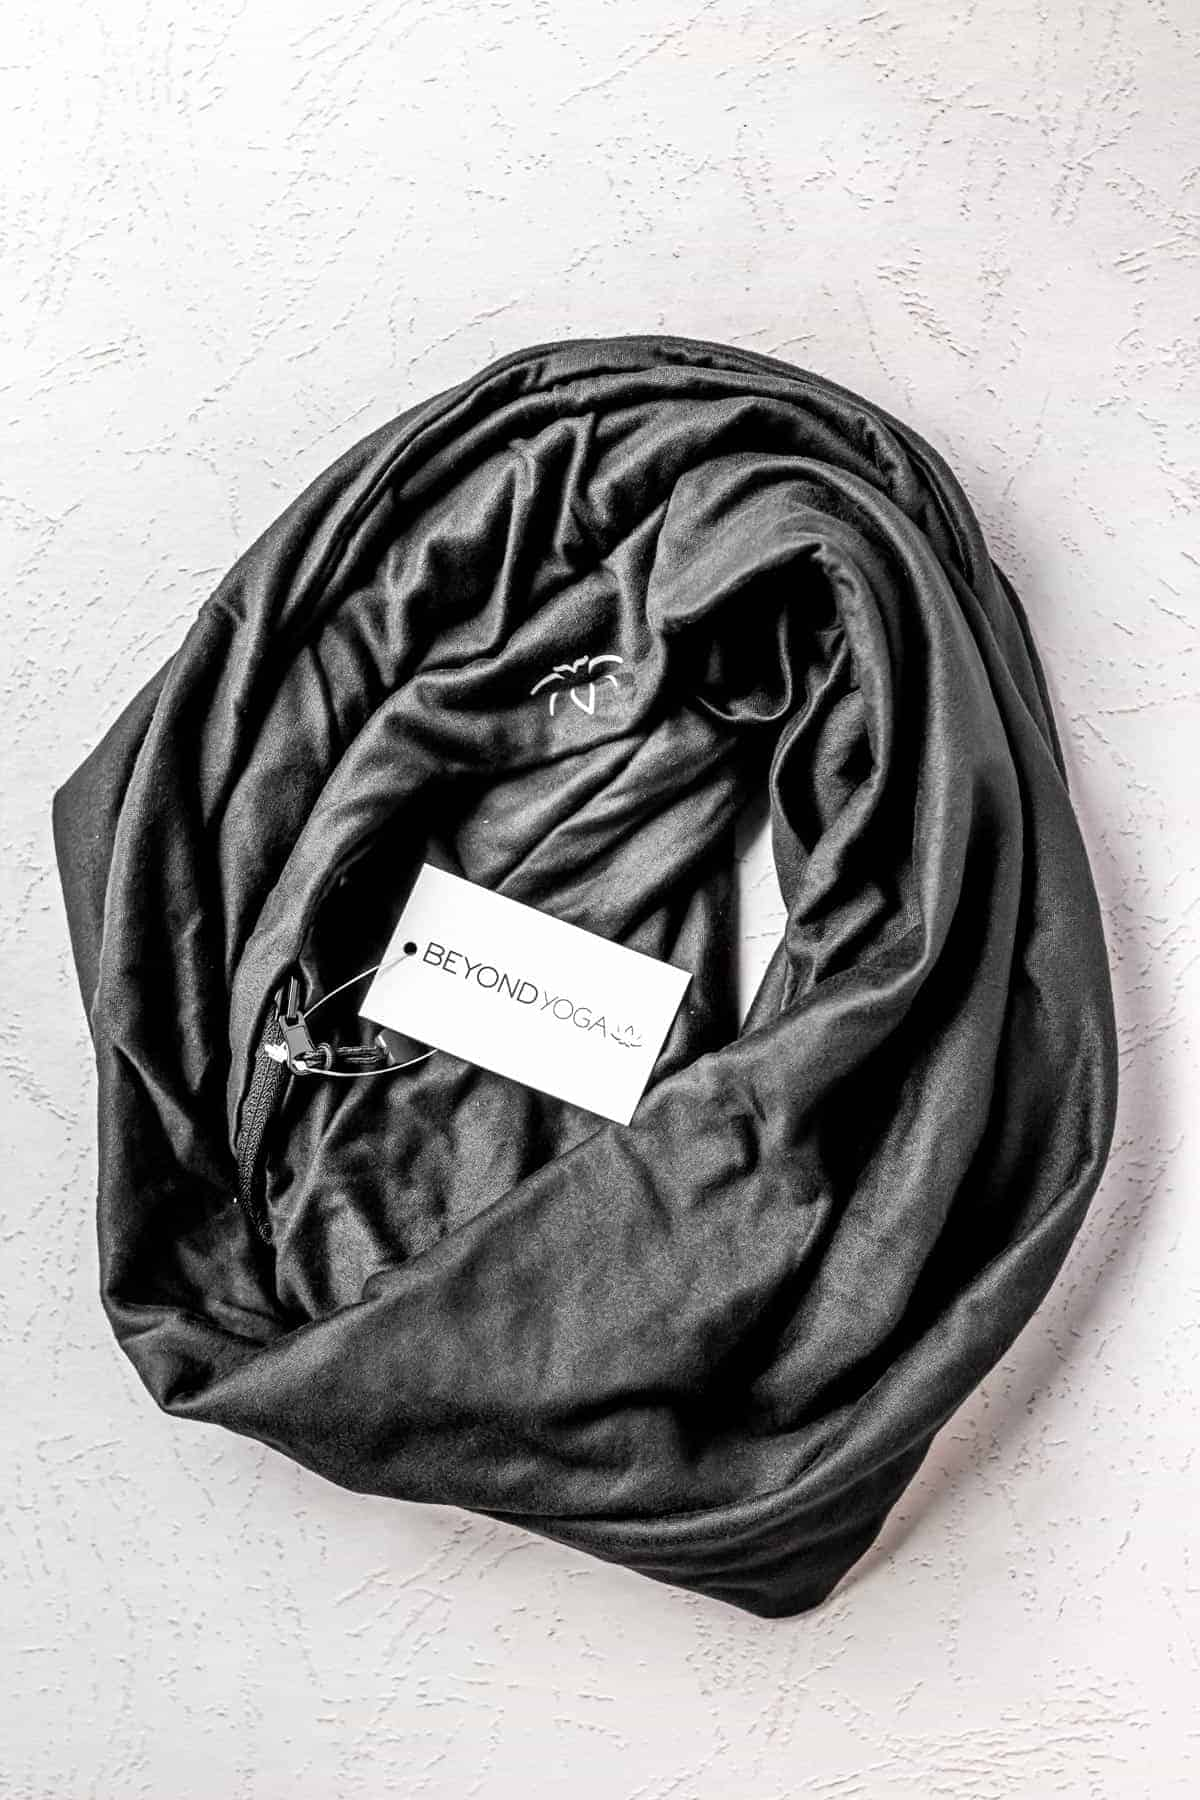 Beyond Yoga Infinity Hidden Pocket Scarf in black on a light background